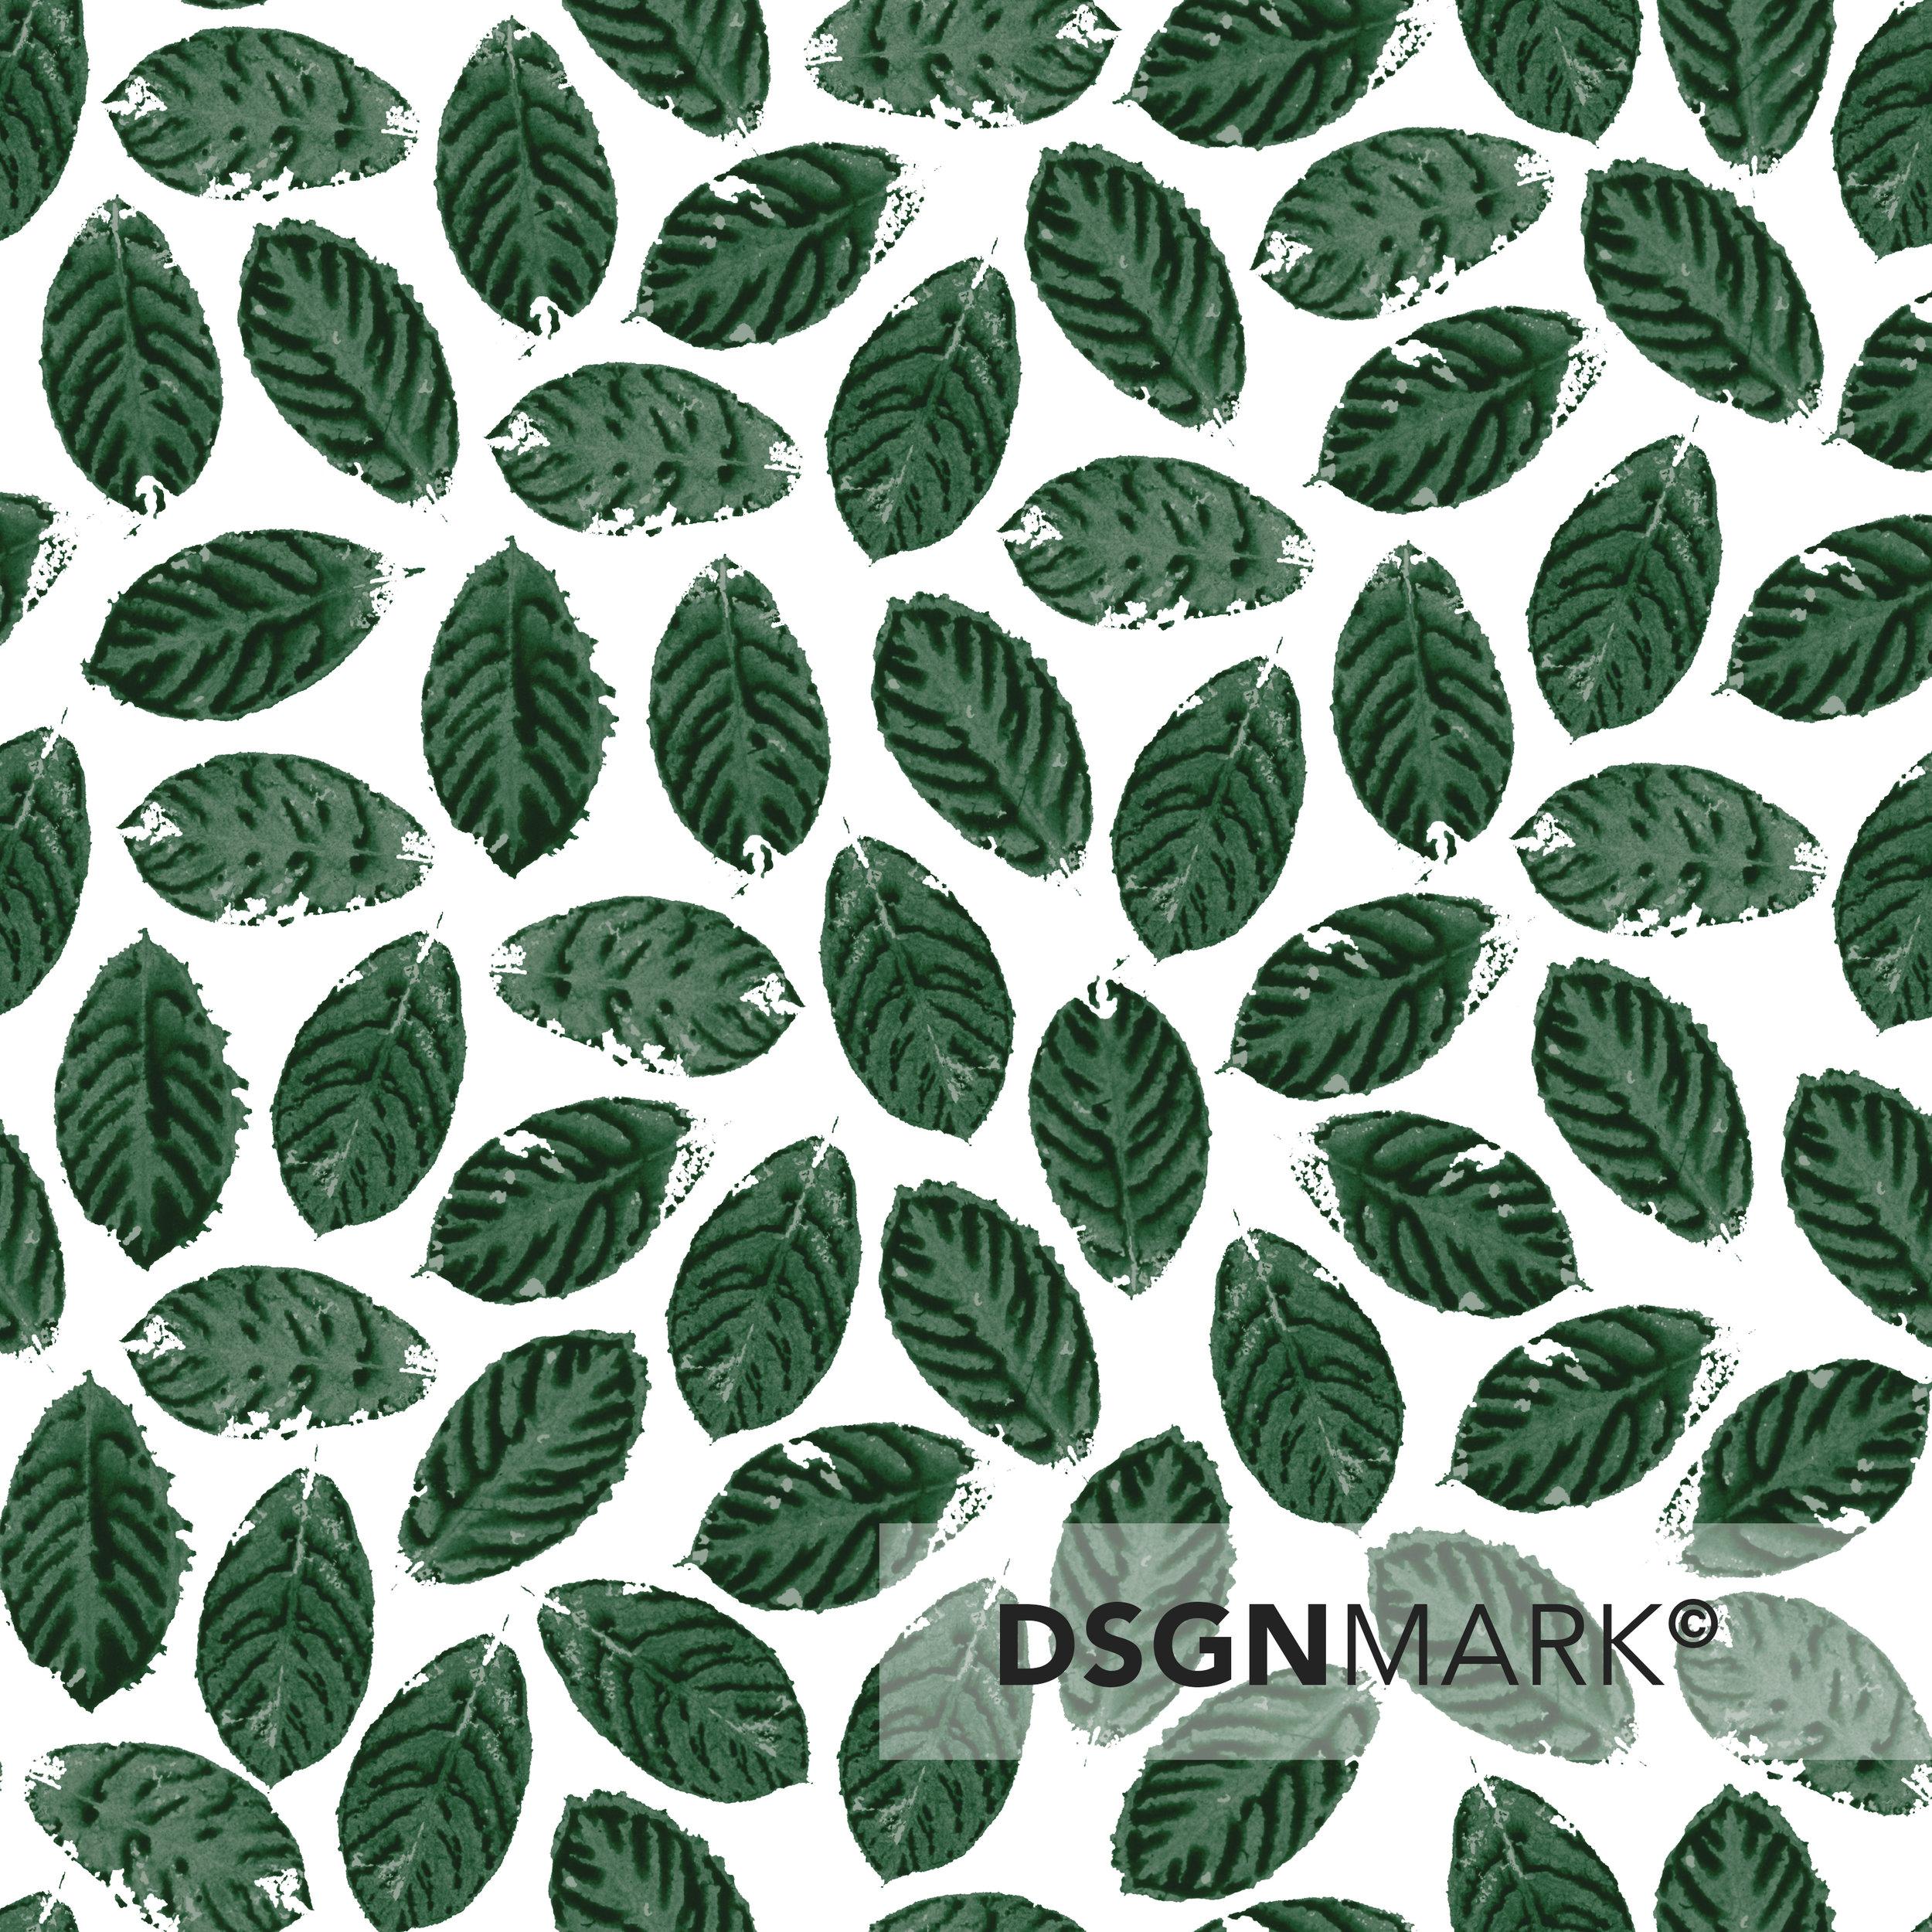 Green_Leaves-02.jpg